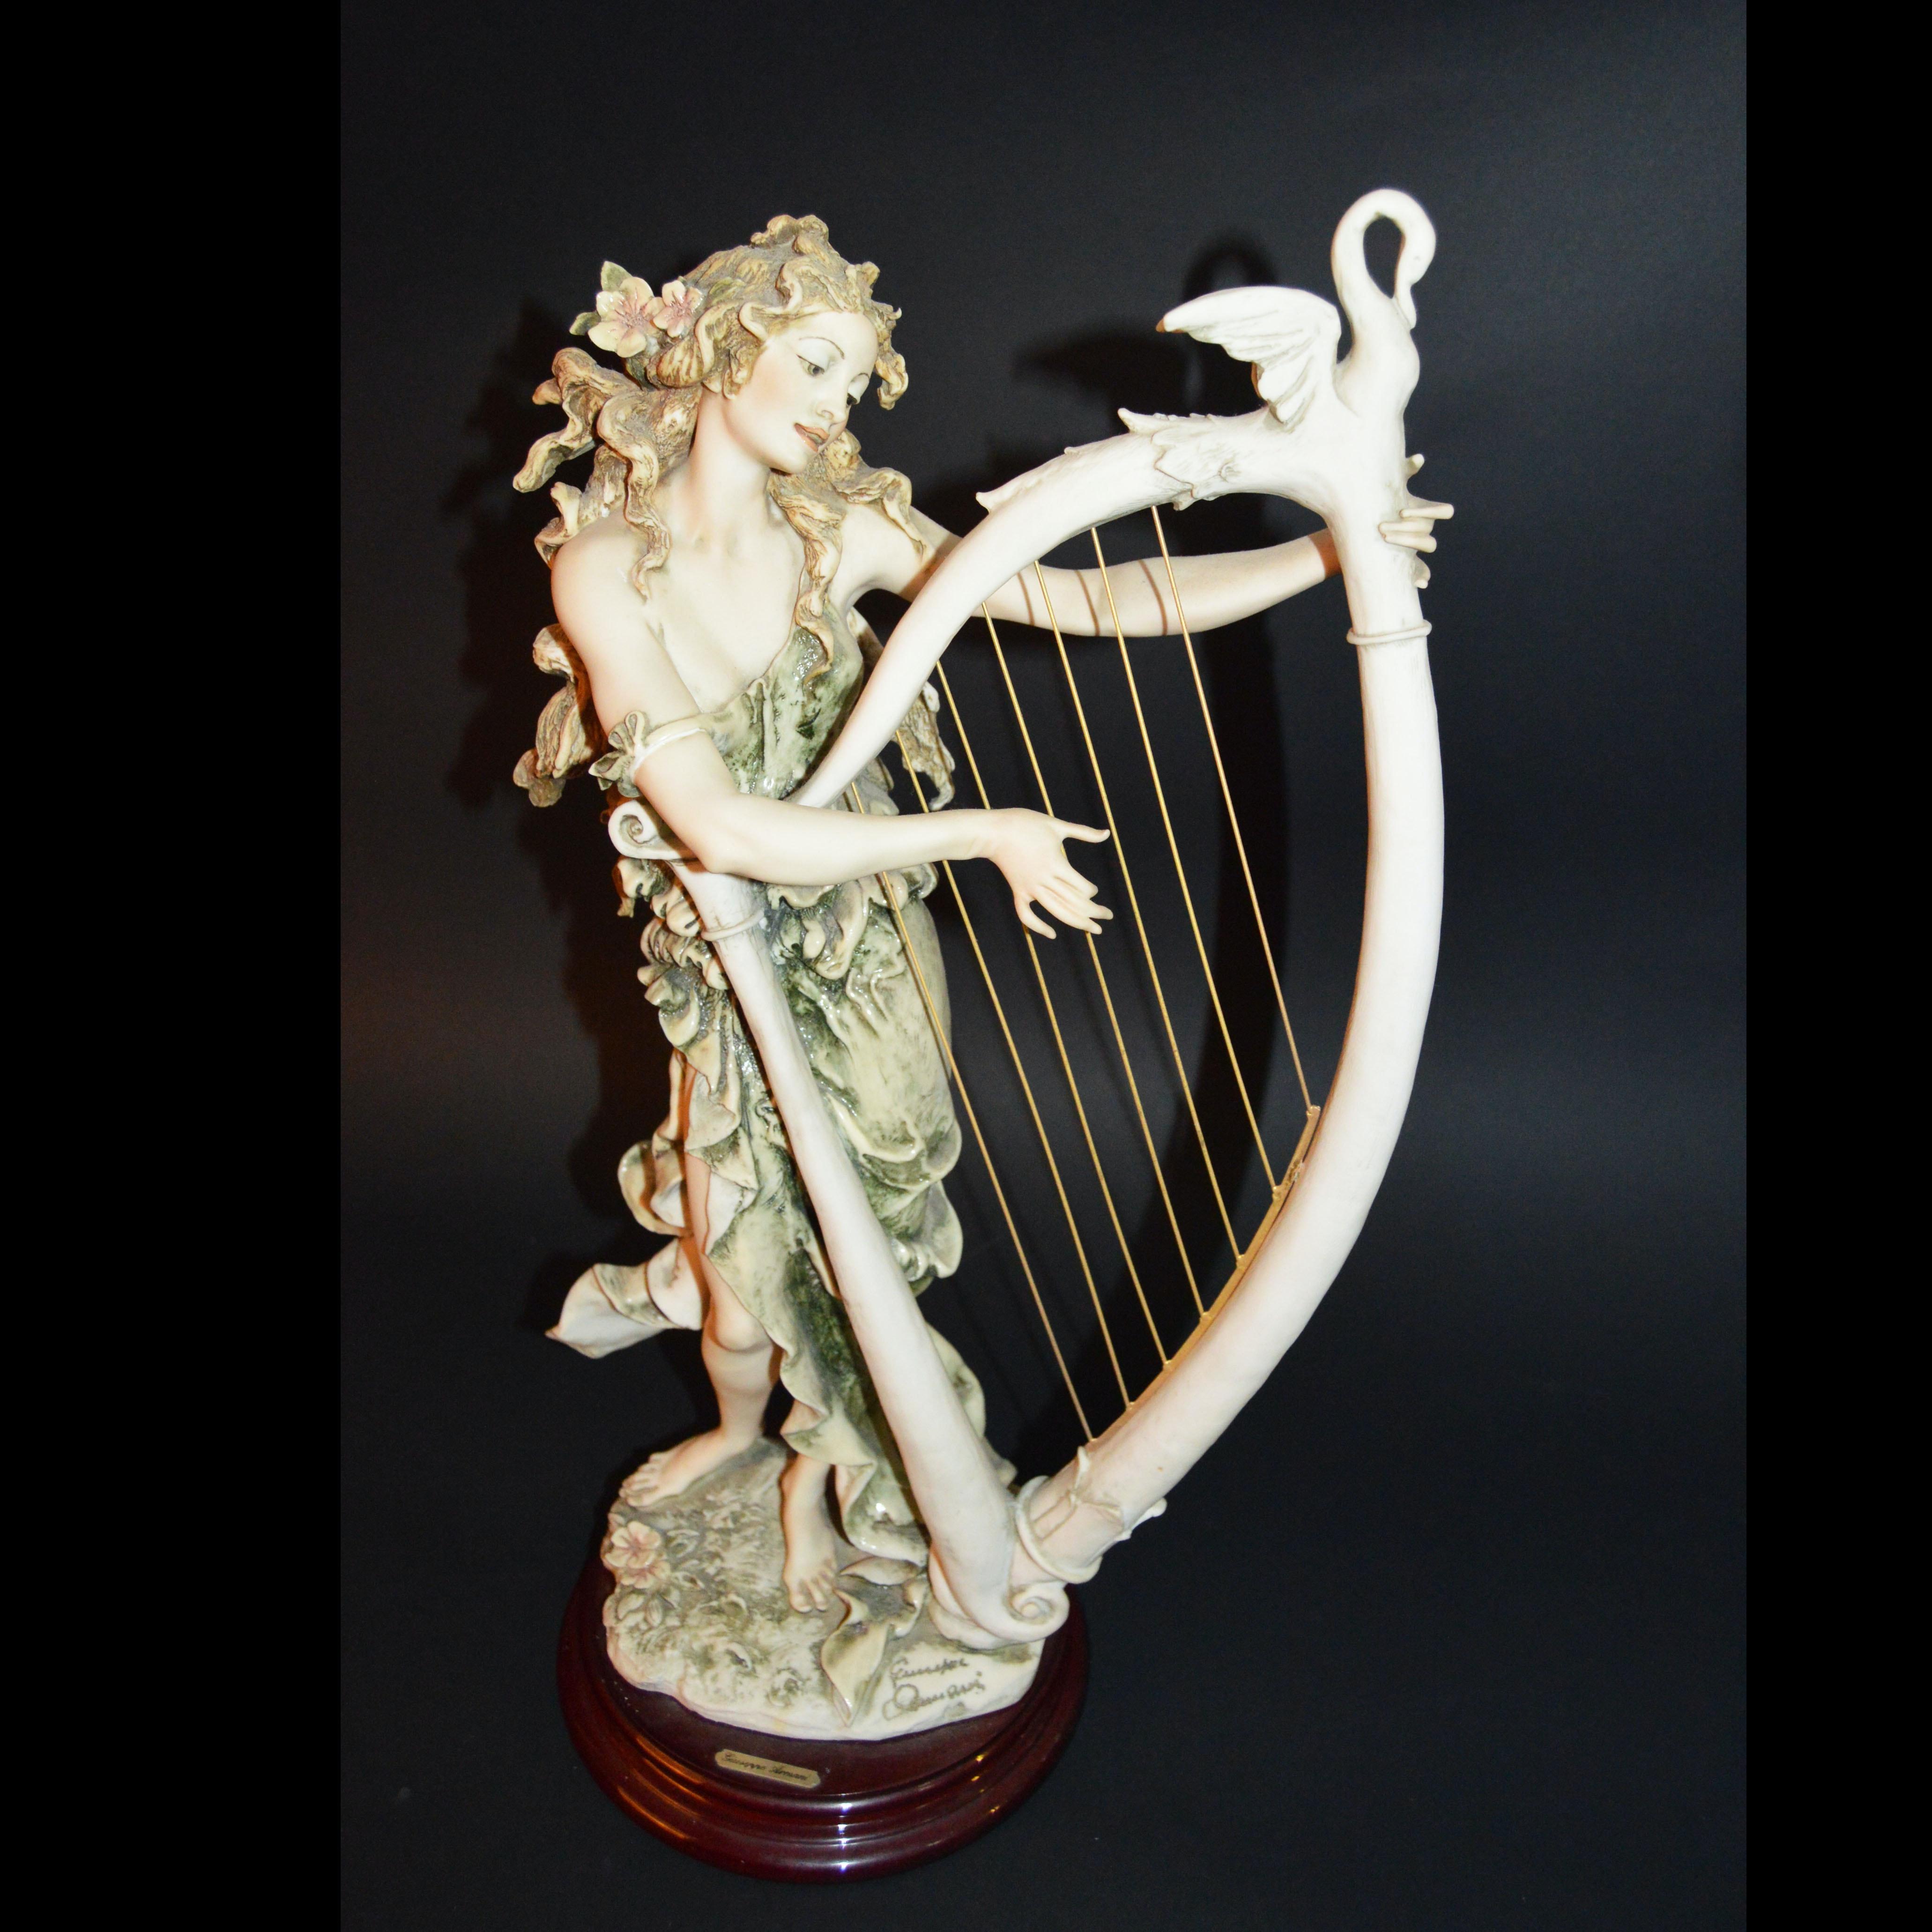 Giuseppe Armani Angelica Playing Harp Sculpture